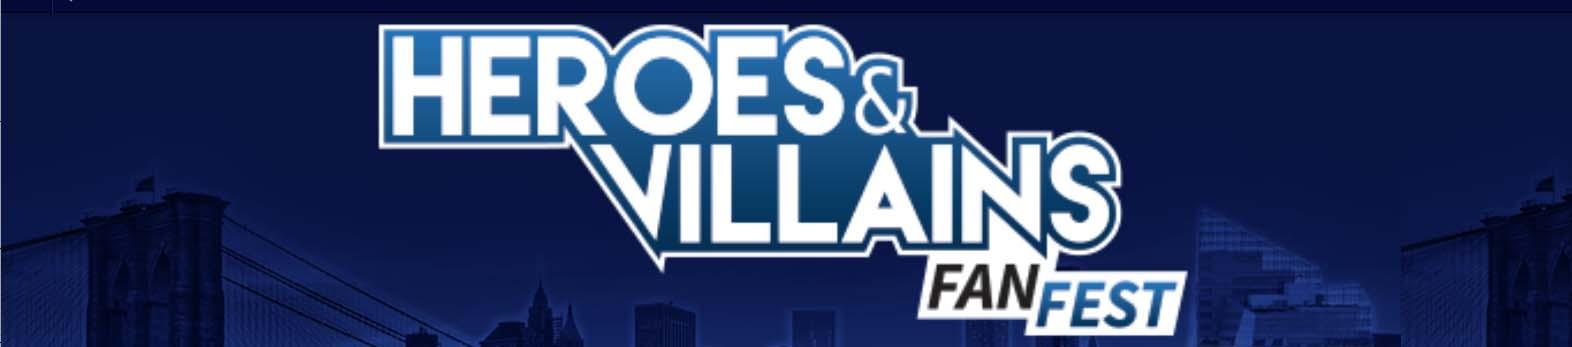 Edison, NJ   Show Floor Hours: Saturday:  10:30 AM - 6:00 PM  VIP  Entry: 9:00 AM  Sunday:  10:30 AM - 5:00 PM  VIP  Entry: 9:00 AM